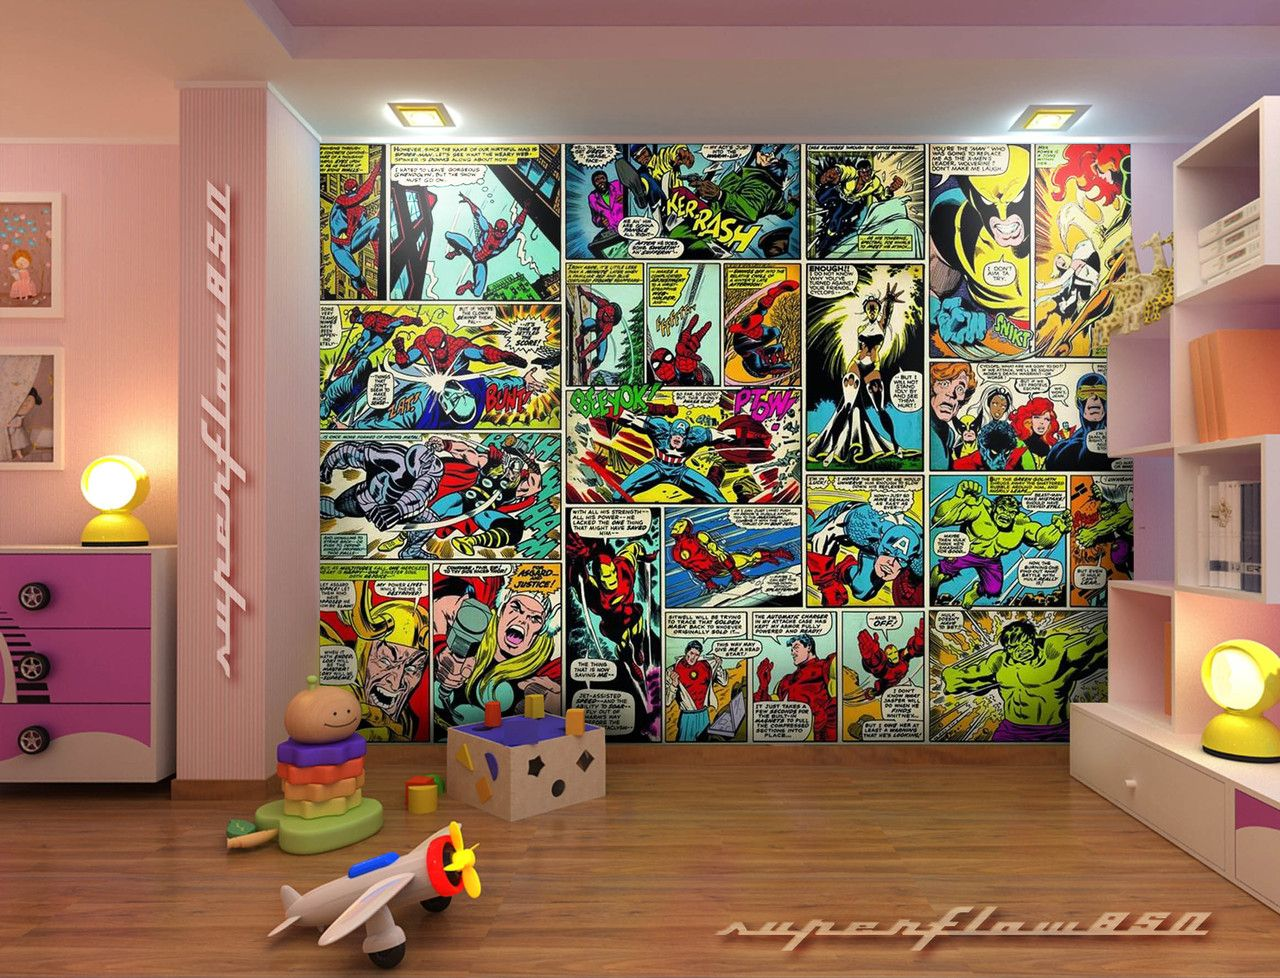 Marvel Wall Mural what a 'marvellous' wall. #marvel #playroom | superhero playroom